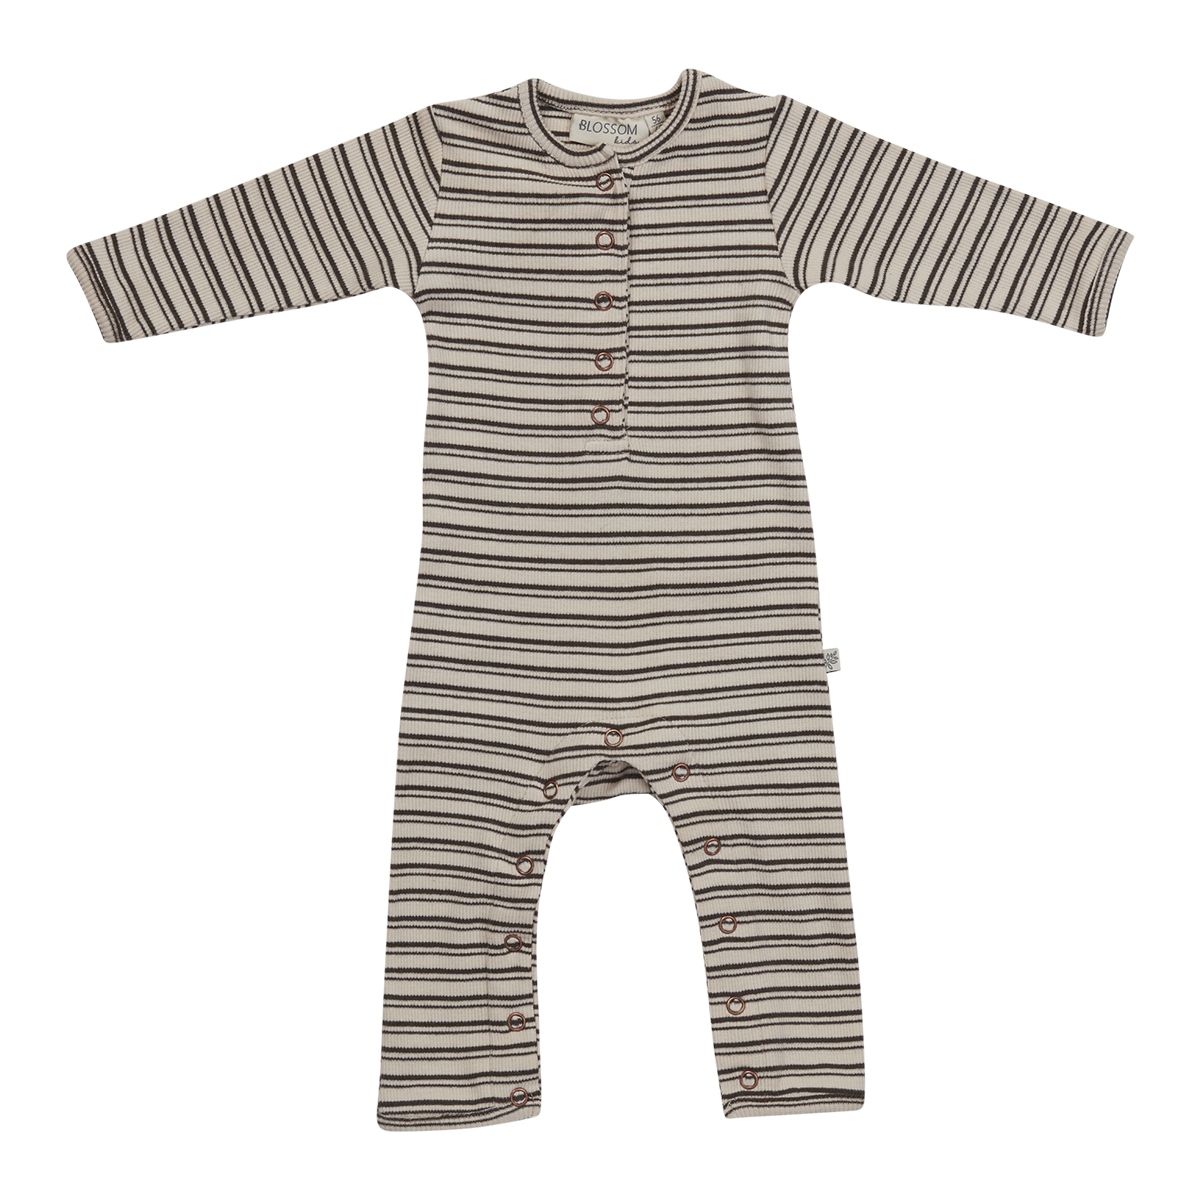 Blossom kids Playsuit Cinnamon Stripes - soft rib